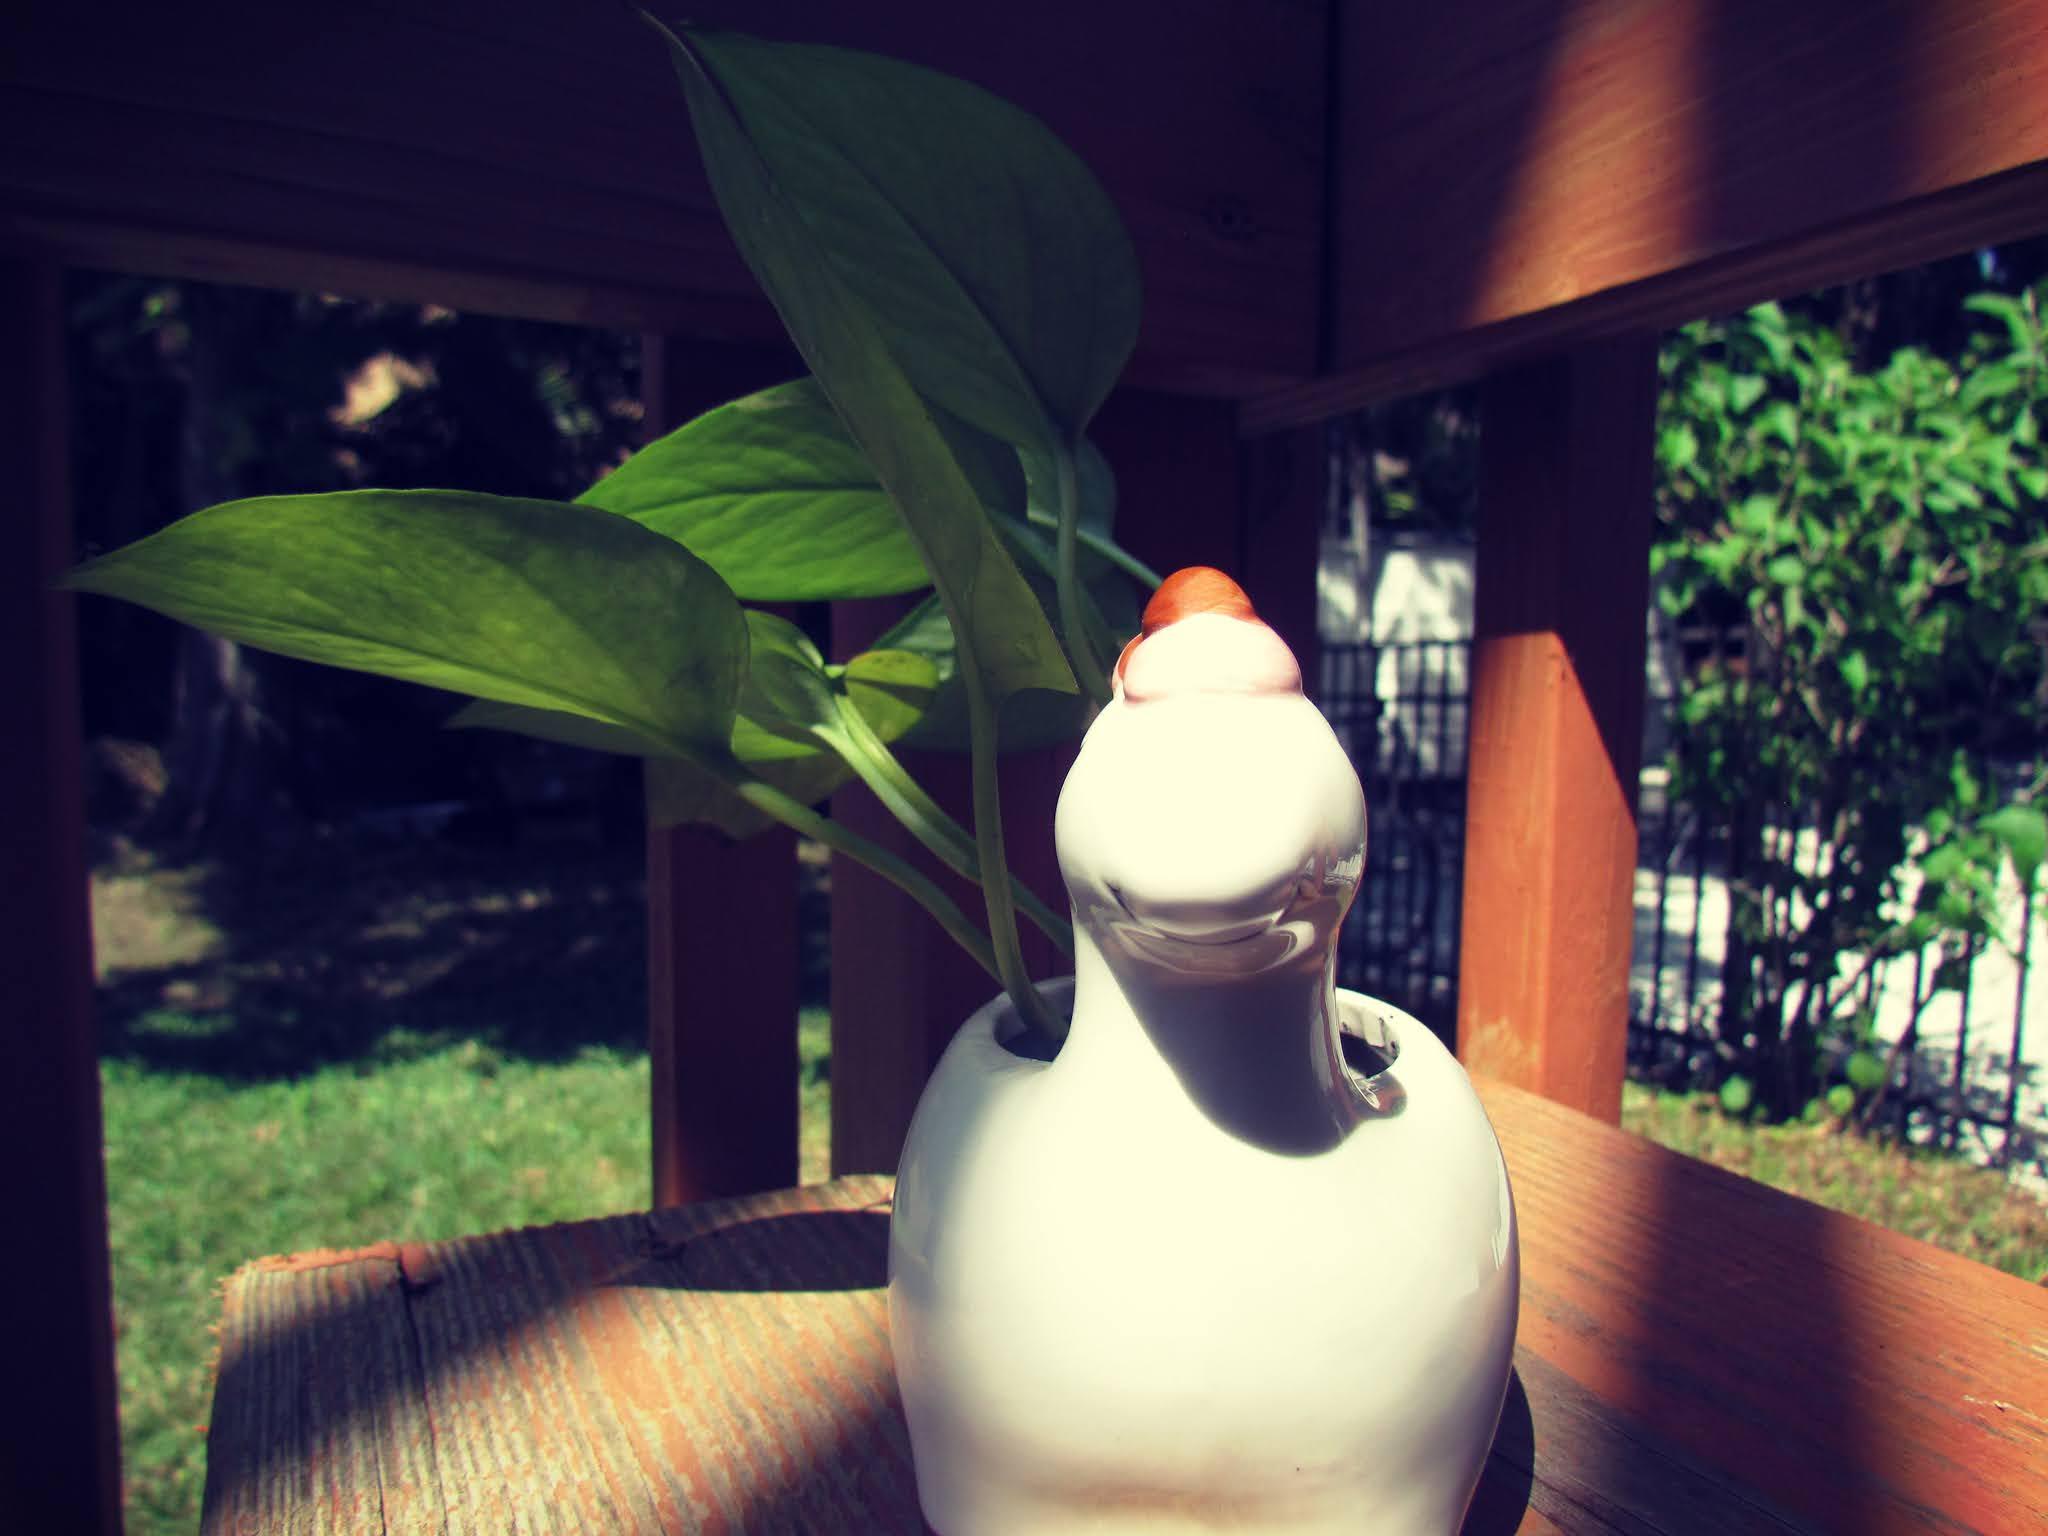 a cute planter, unicorn planter, novelty plant stand, golden pothos plant cutting